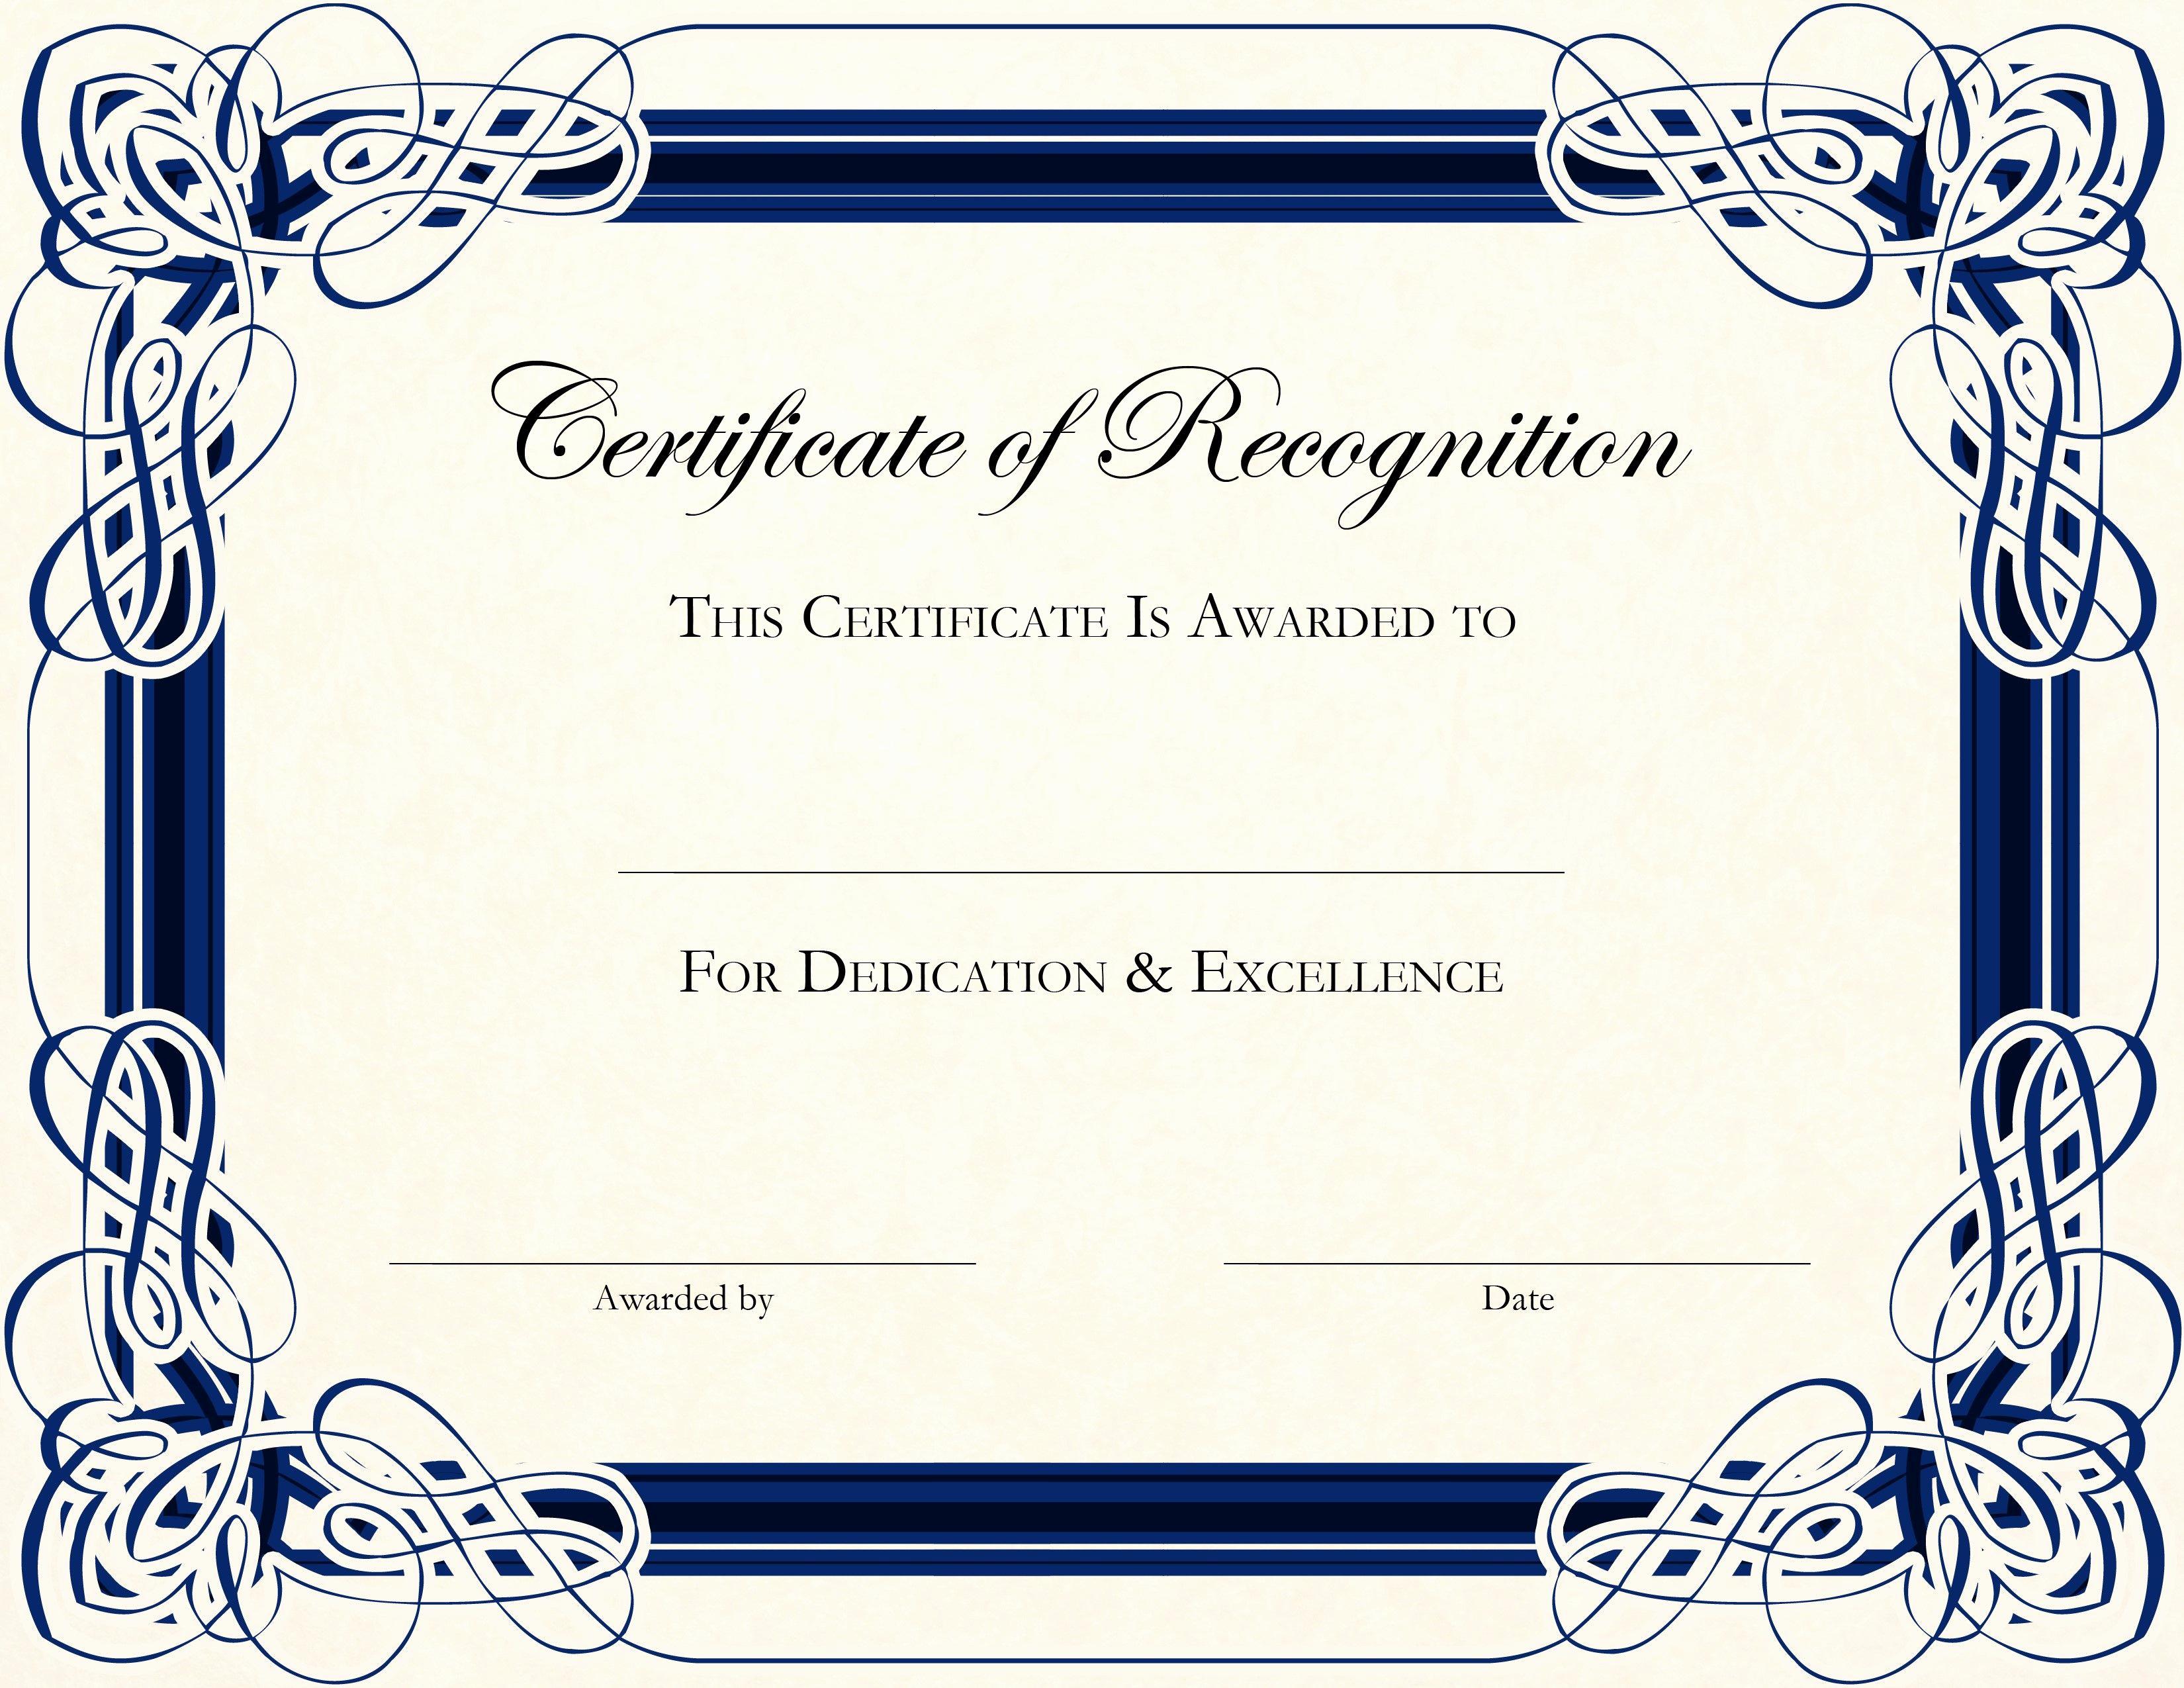 Free Printable Certificate Templates Fresh Free Printable Certificate Templates for Teachers